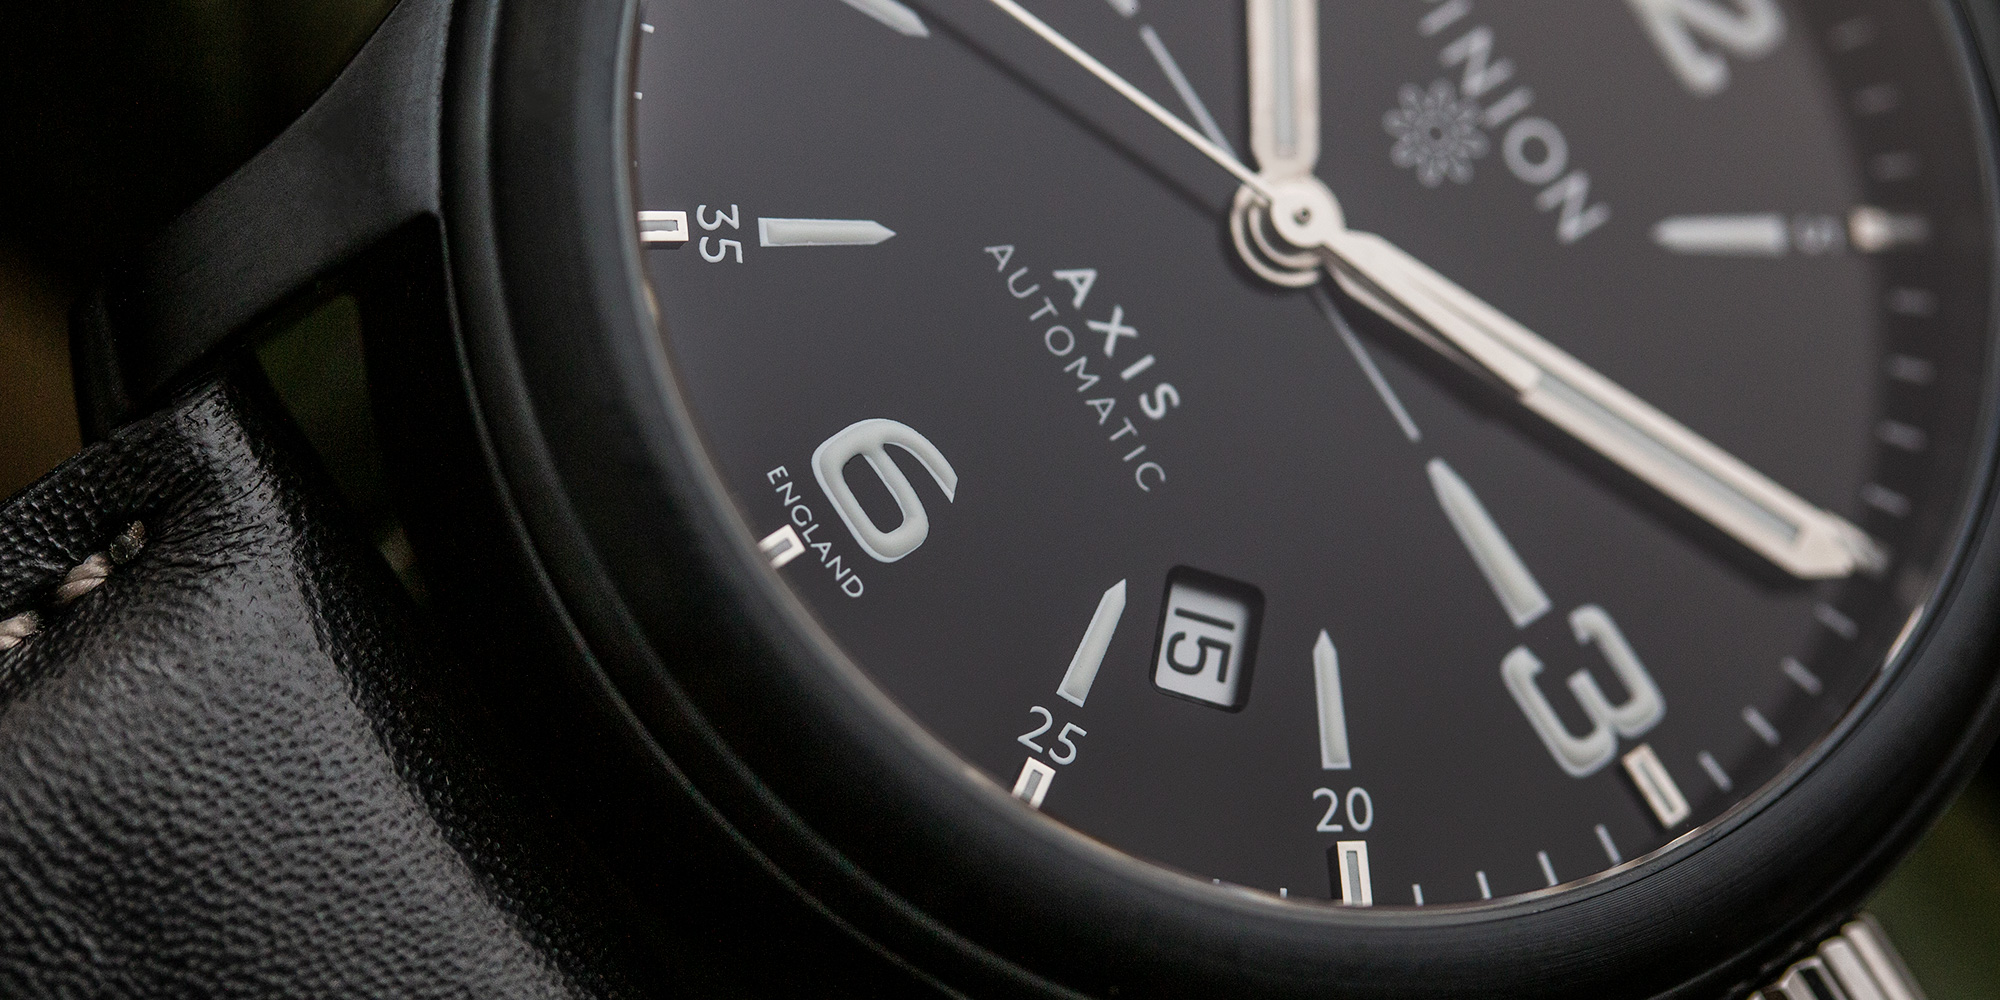 pinion-axis-ii-black-dlc-watch-002